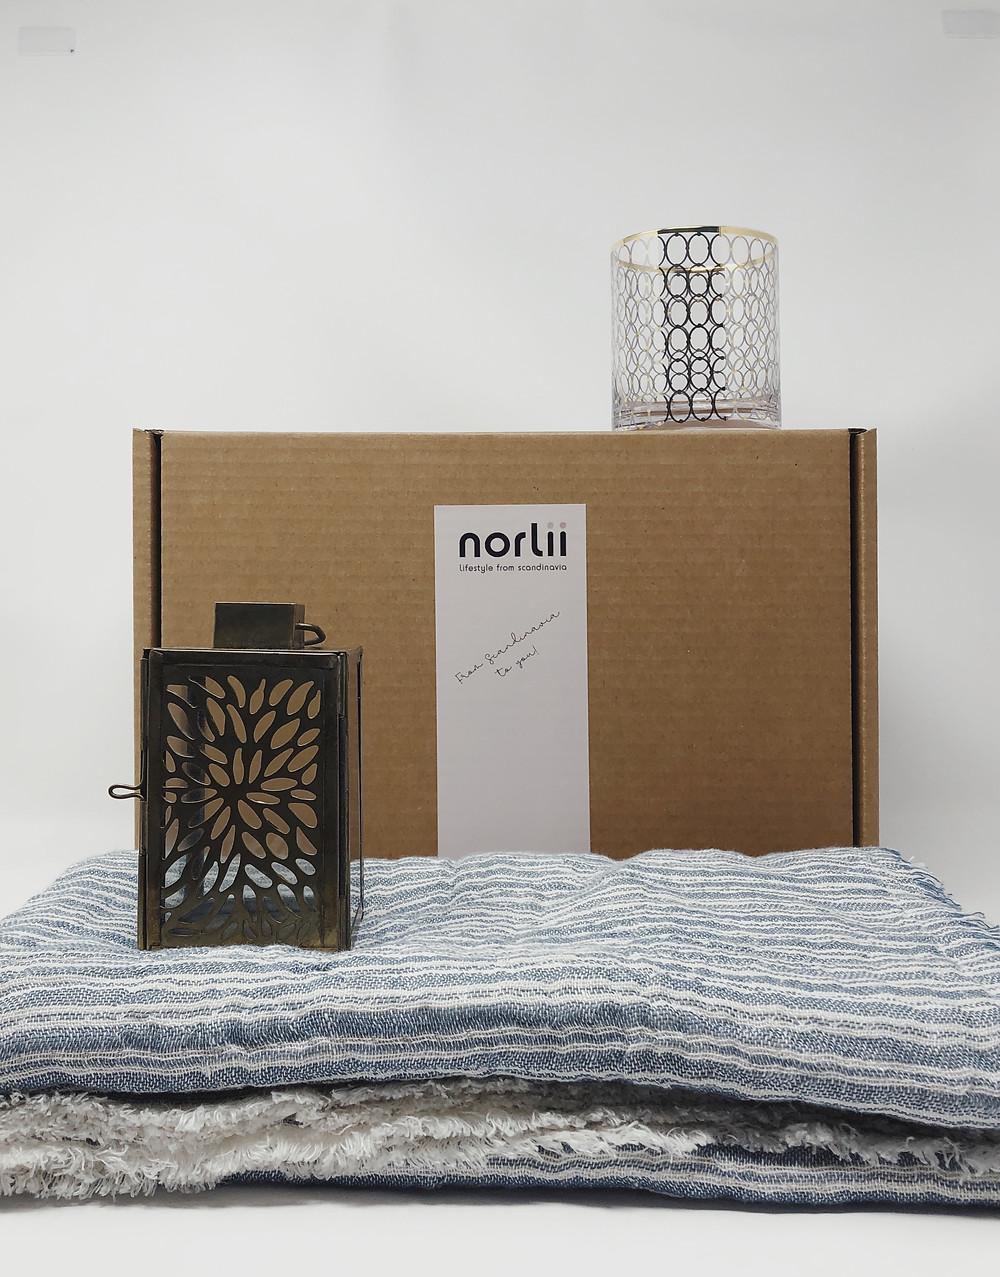 Norlii October Box